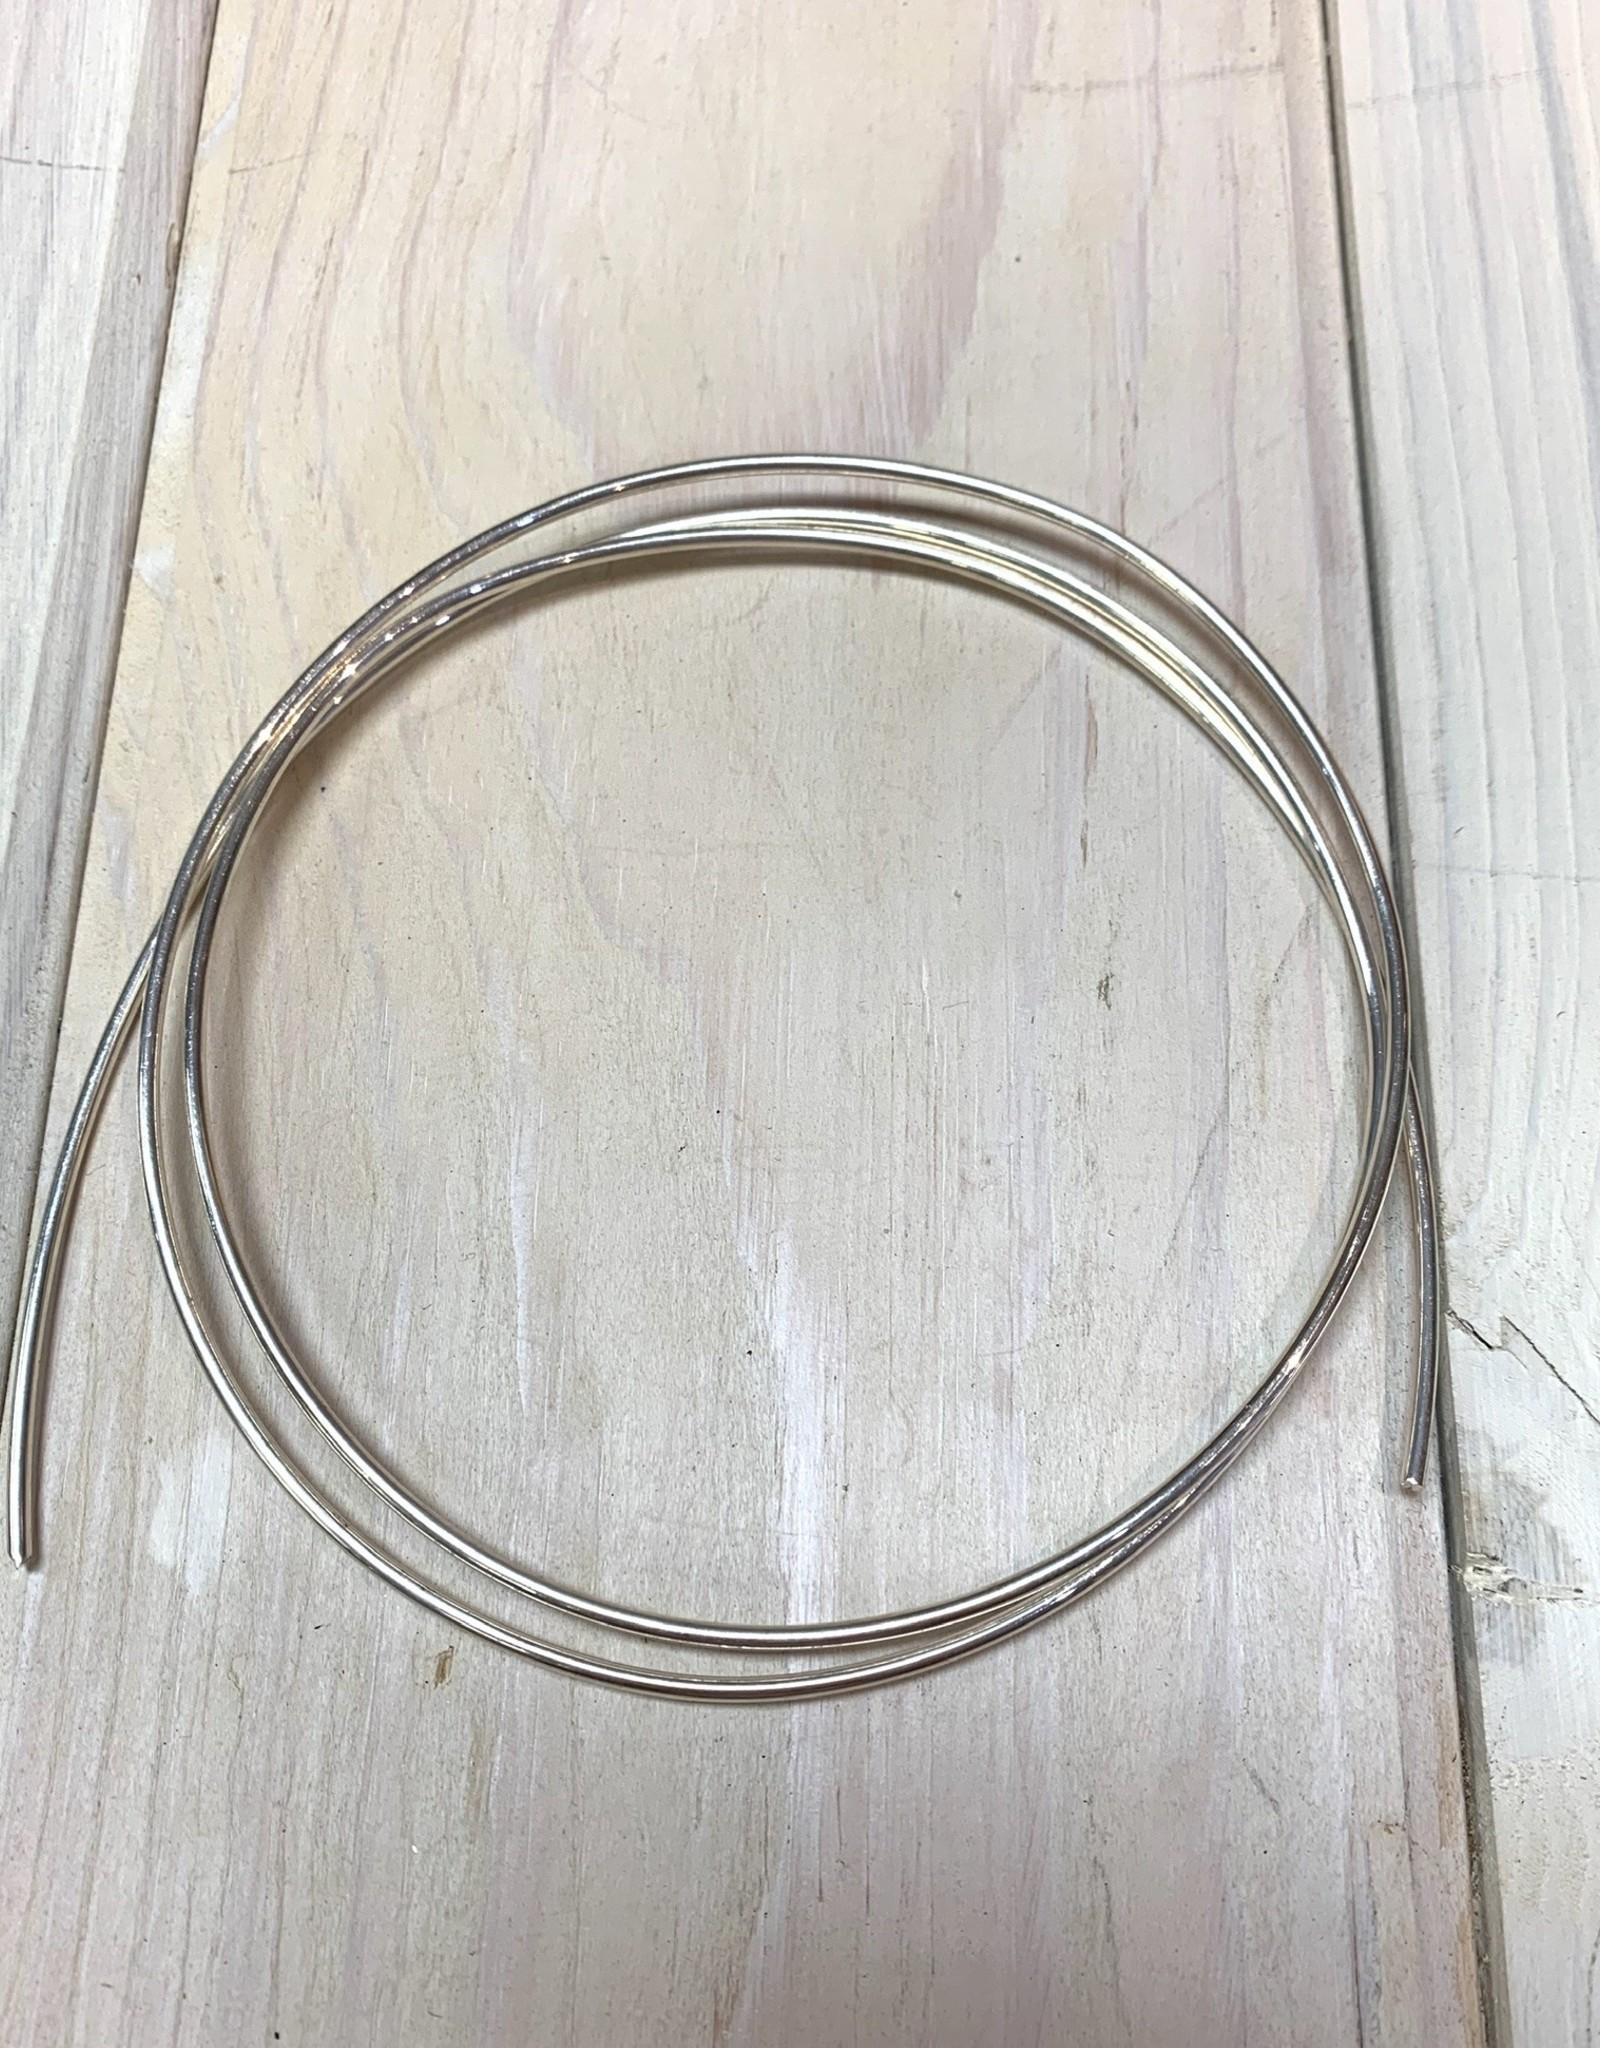 12ga Round Wire Sterling Silver 1oz DS